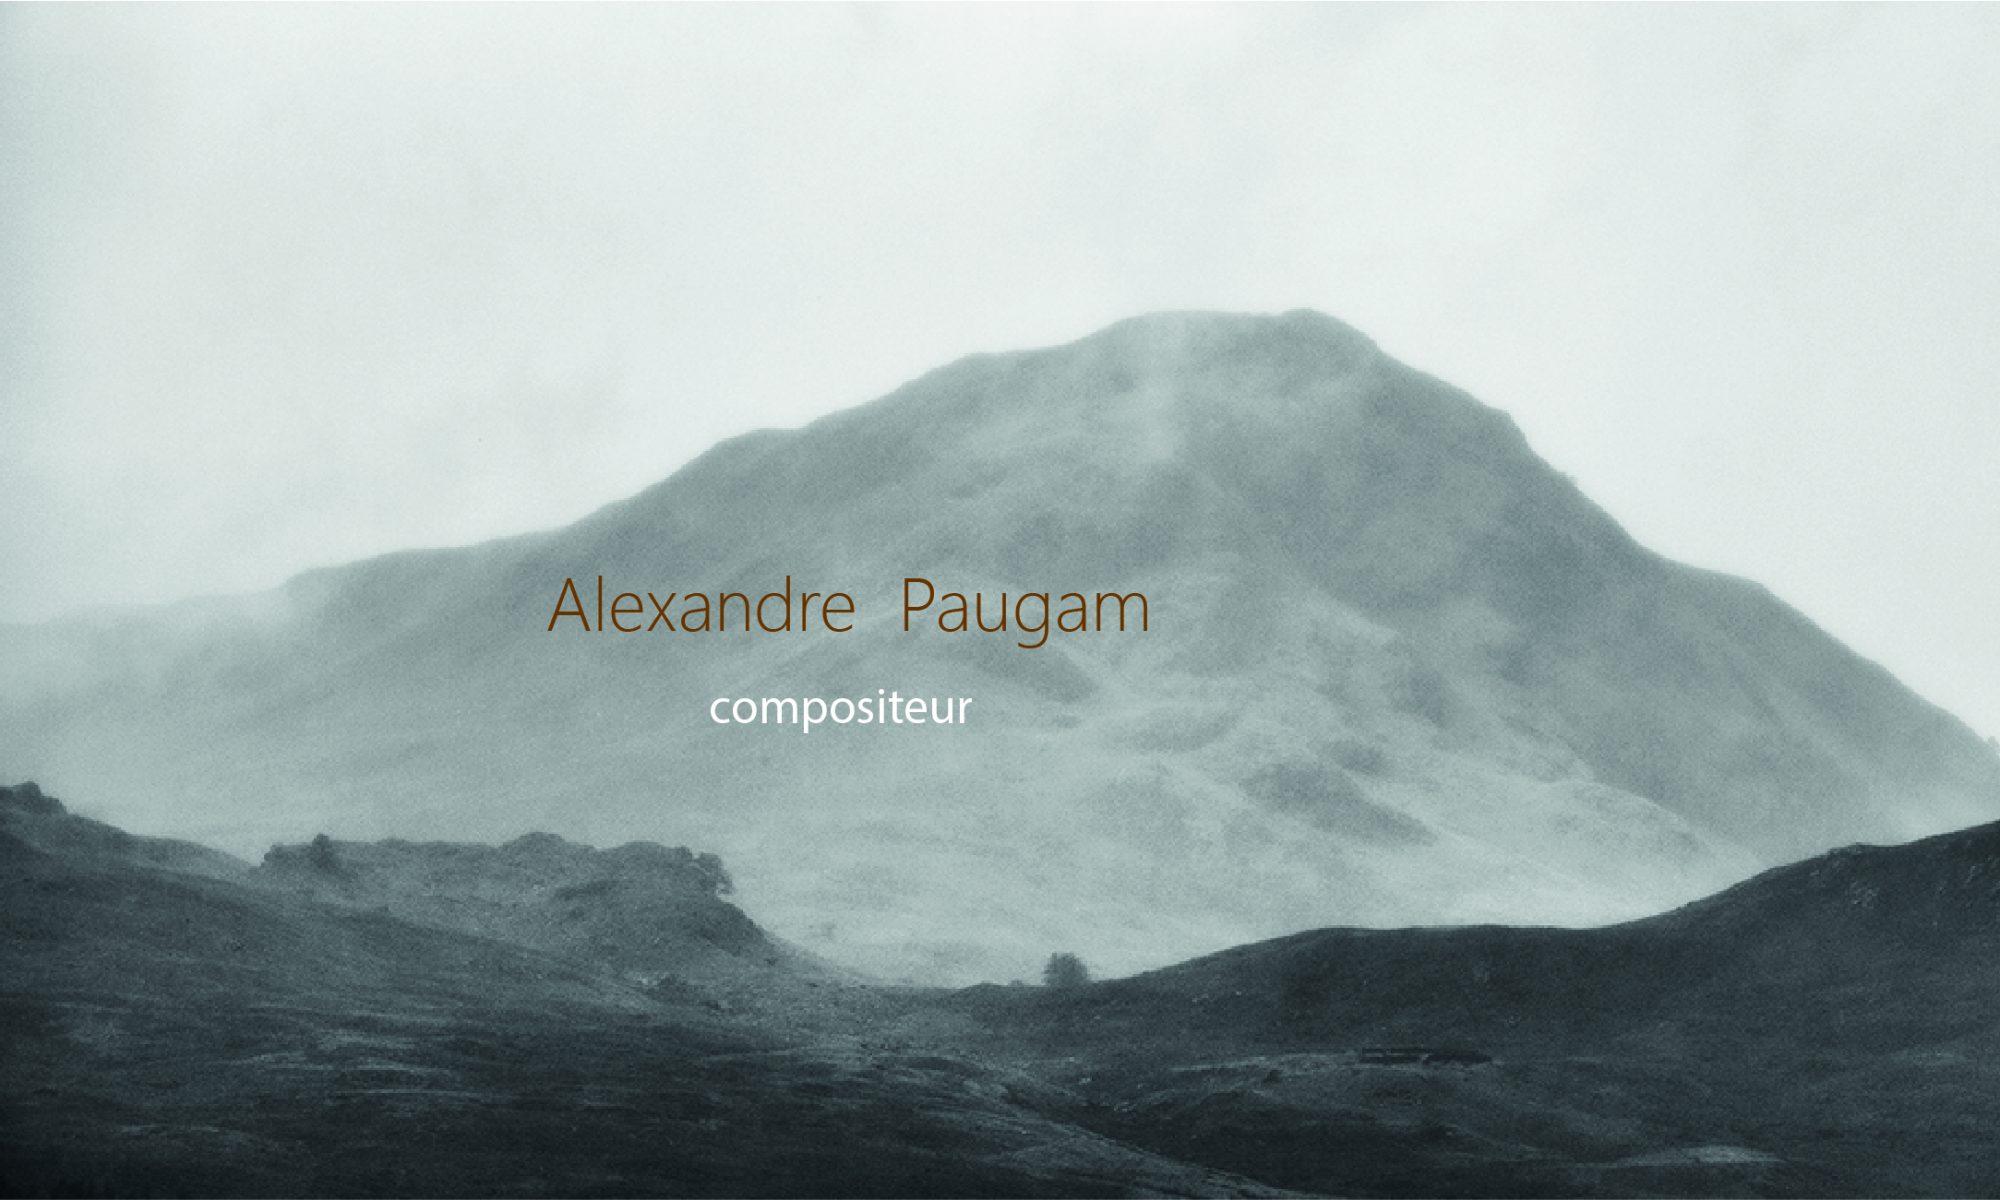 Alexandre Paugam